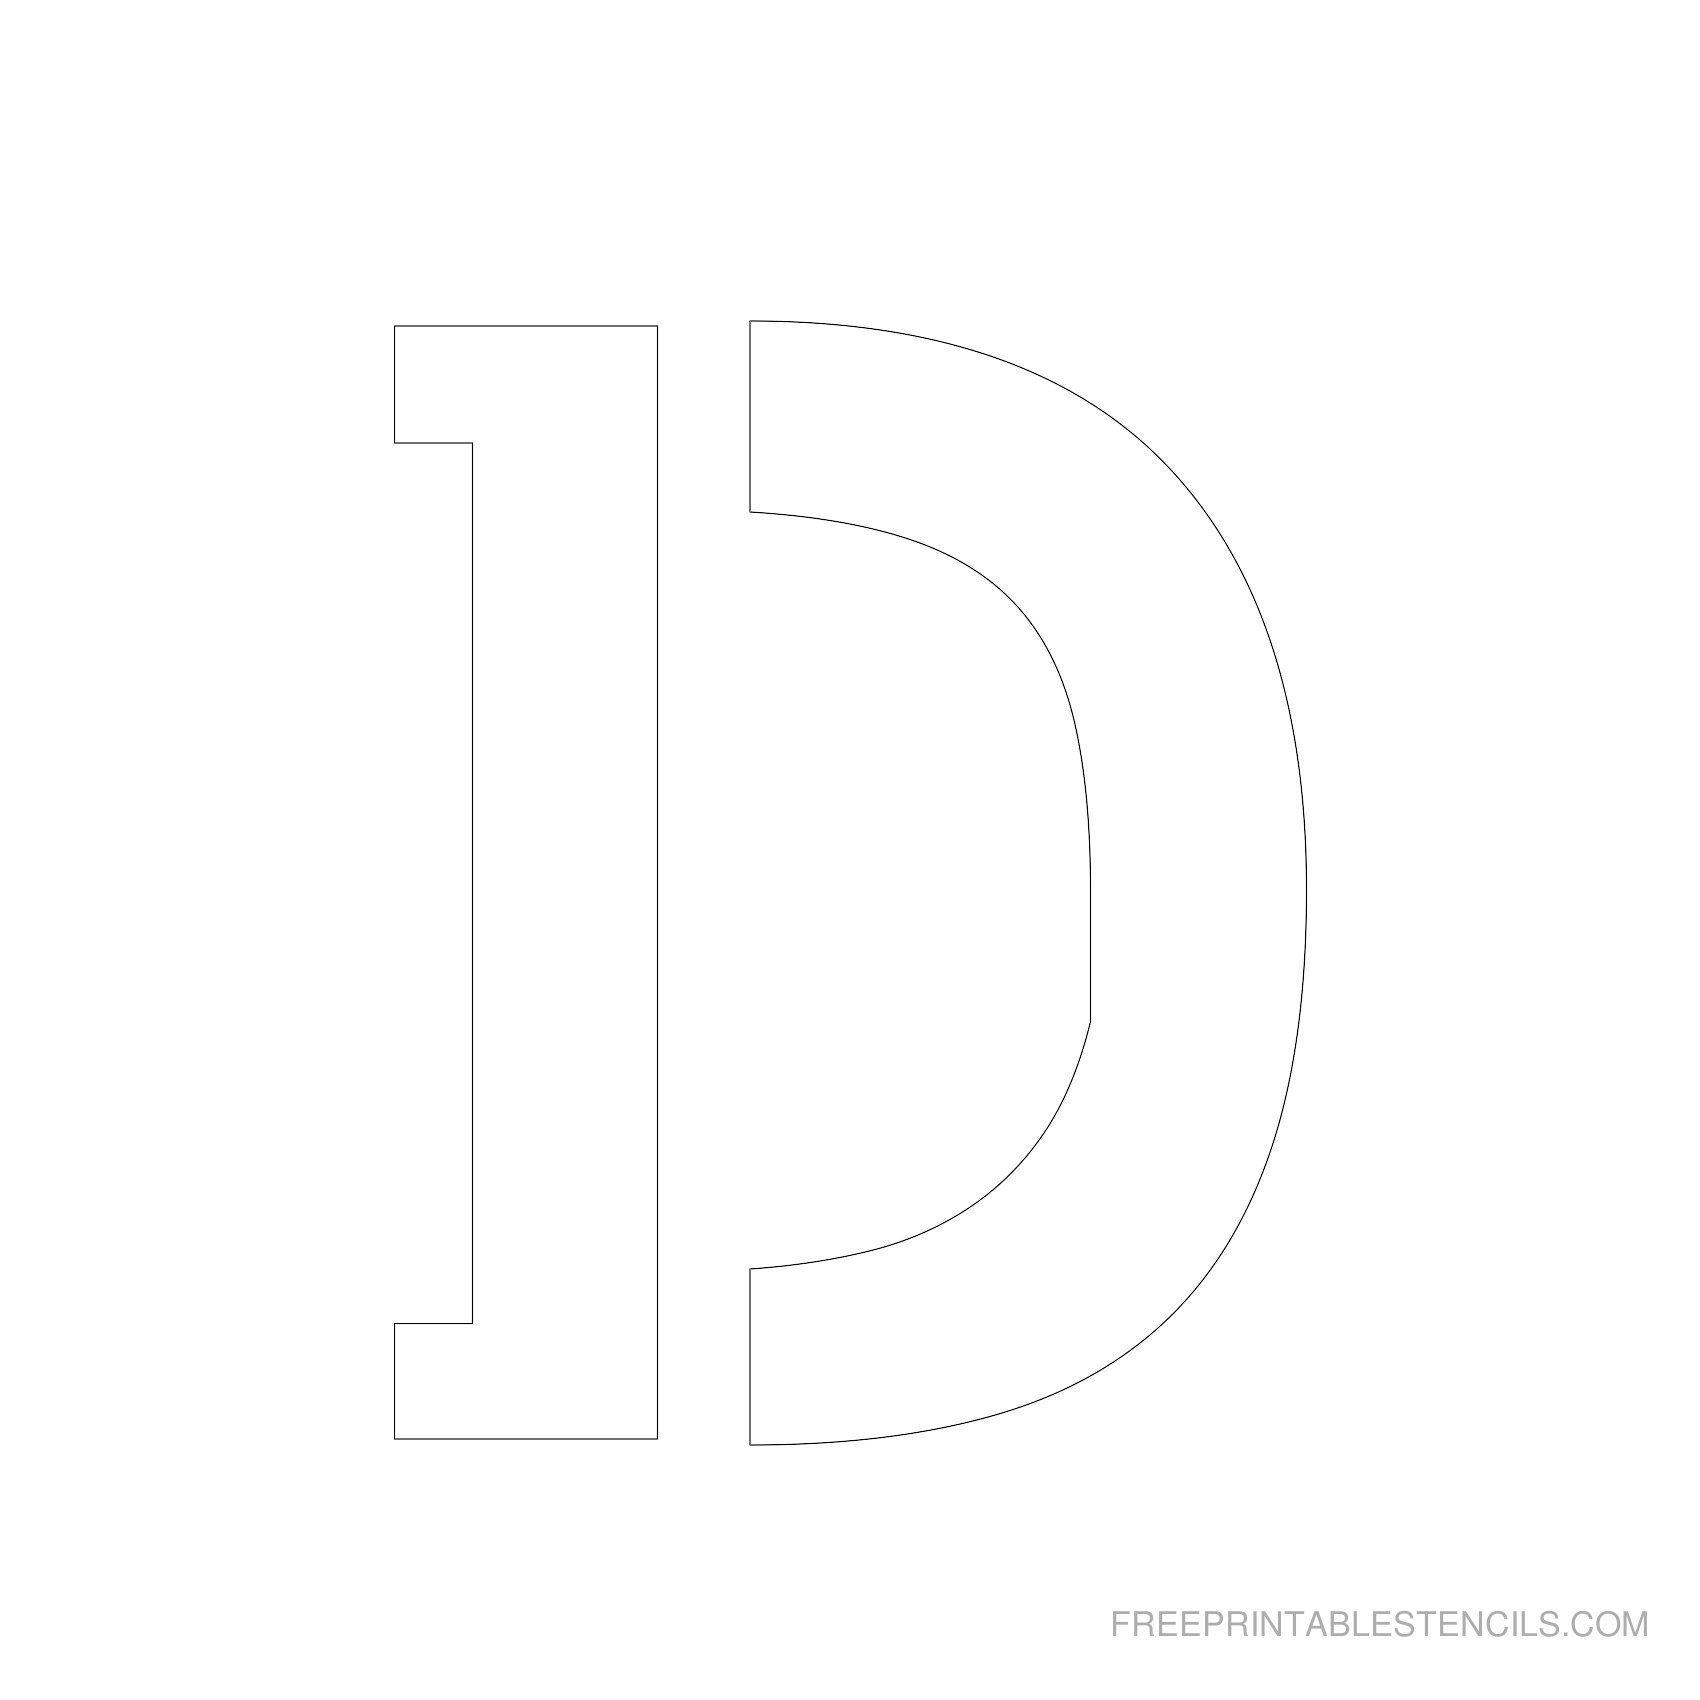 Printable 5 Inch Letter Stencils | Lettering | Pinterest | Letter - Free Printable 5 Inch Number Stencils